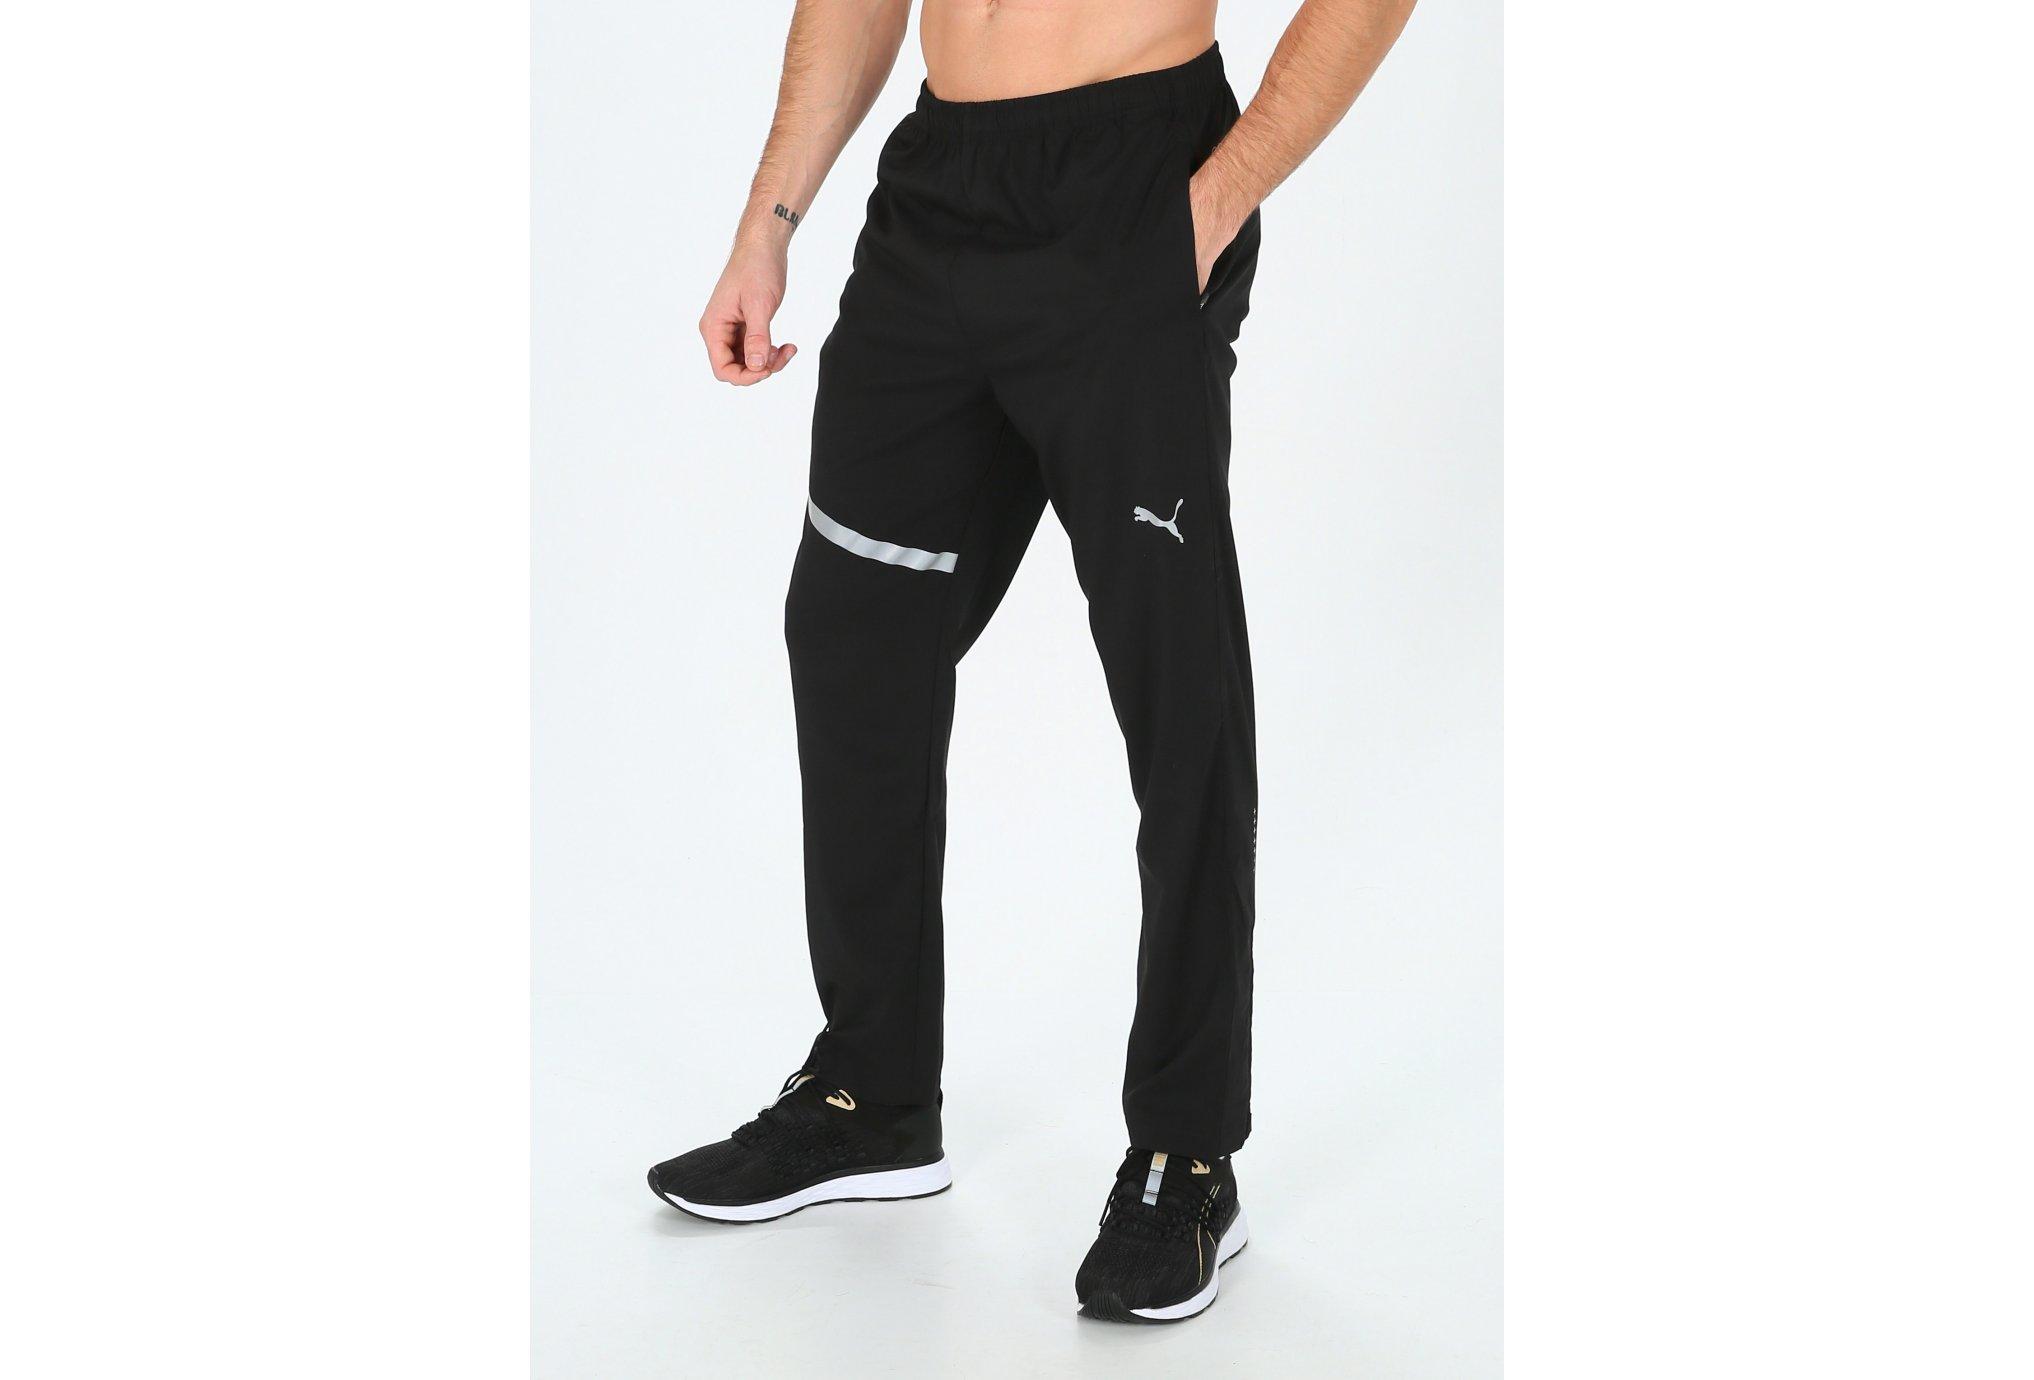 Puma Ignite Woven M vêtement running homme